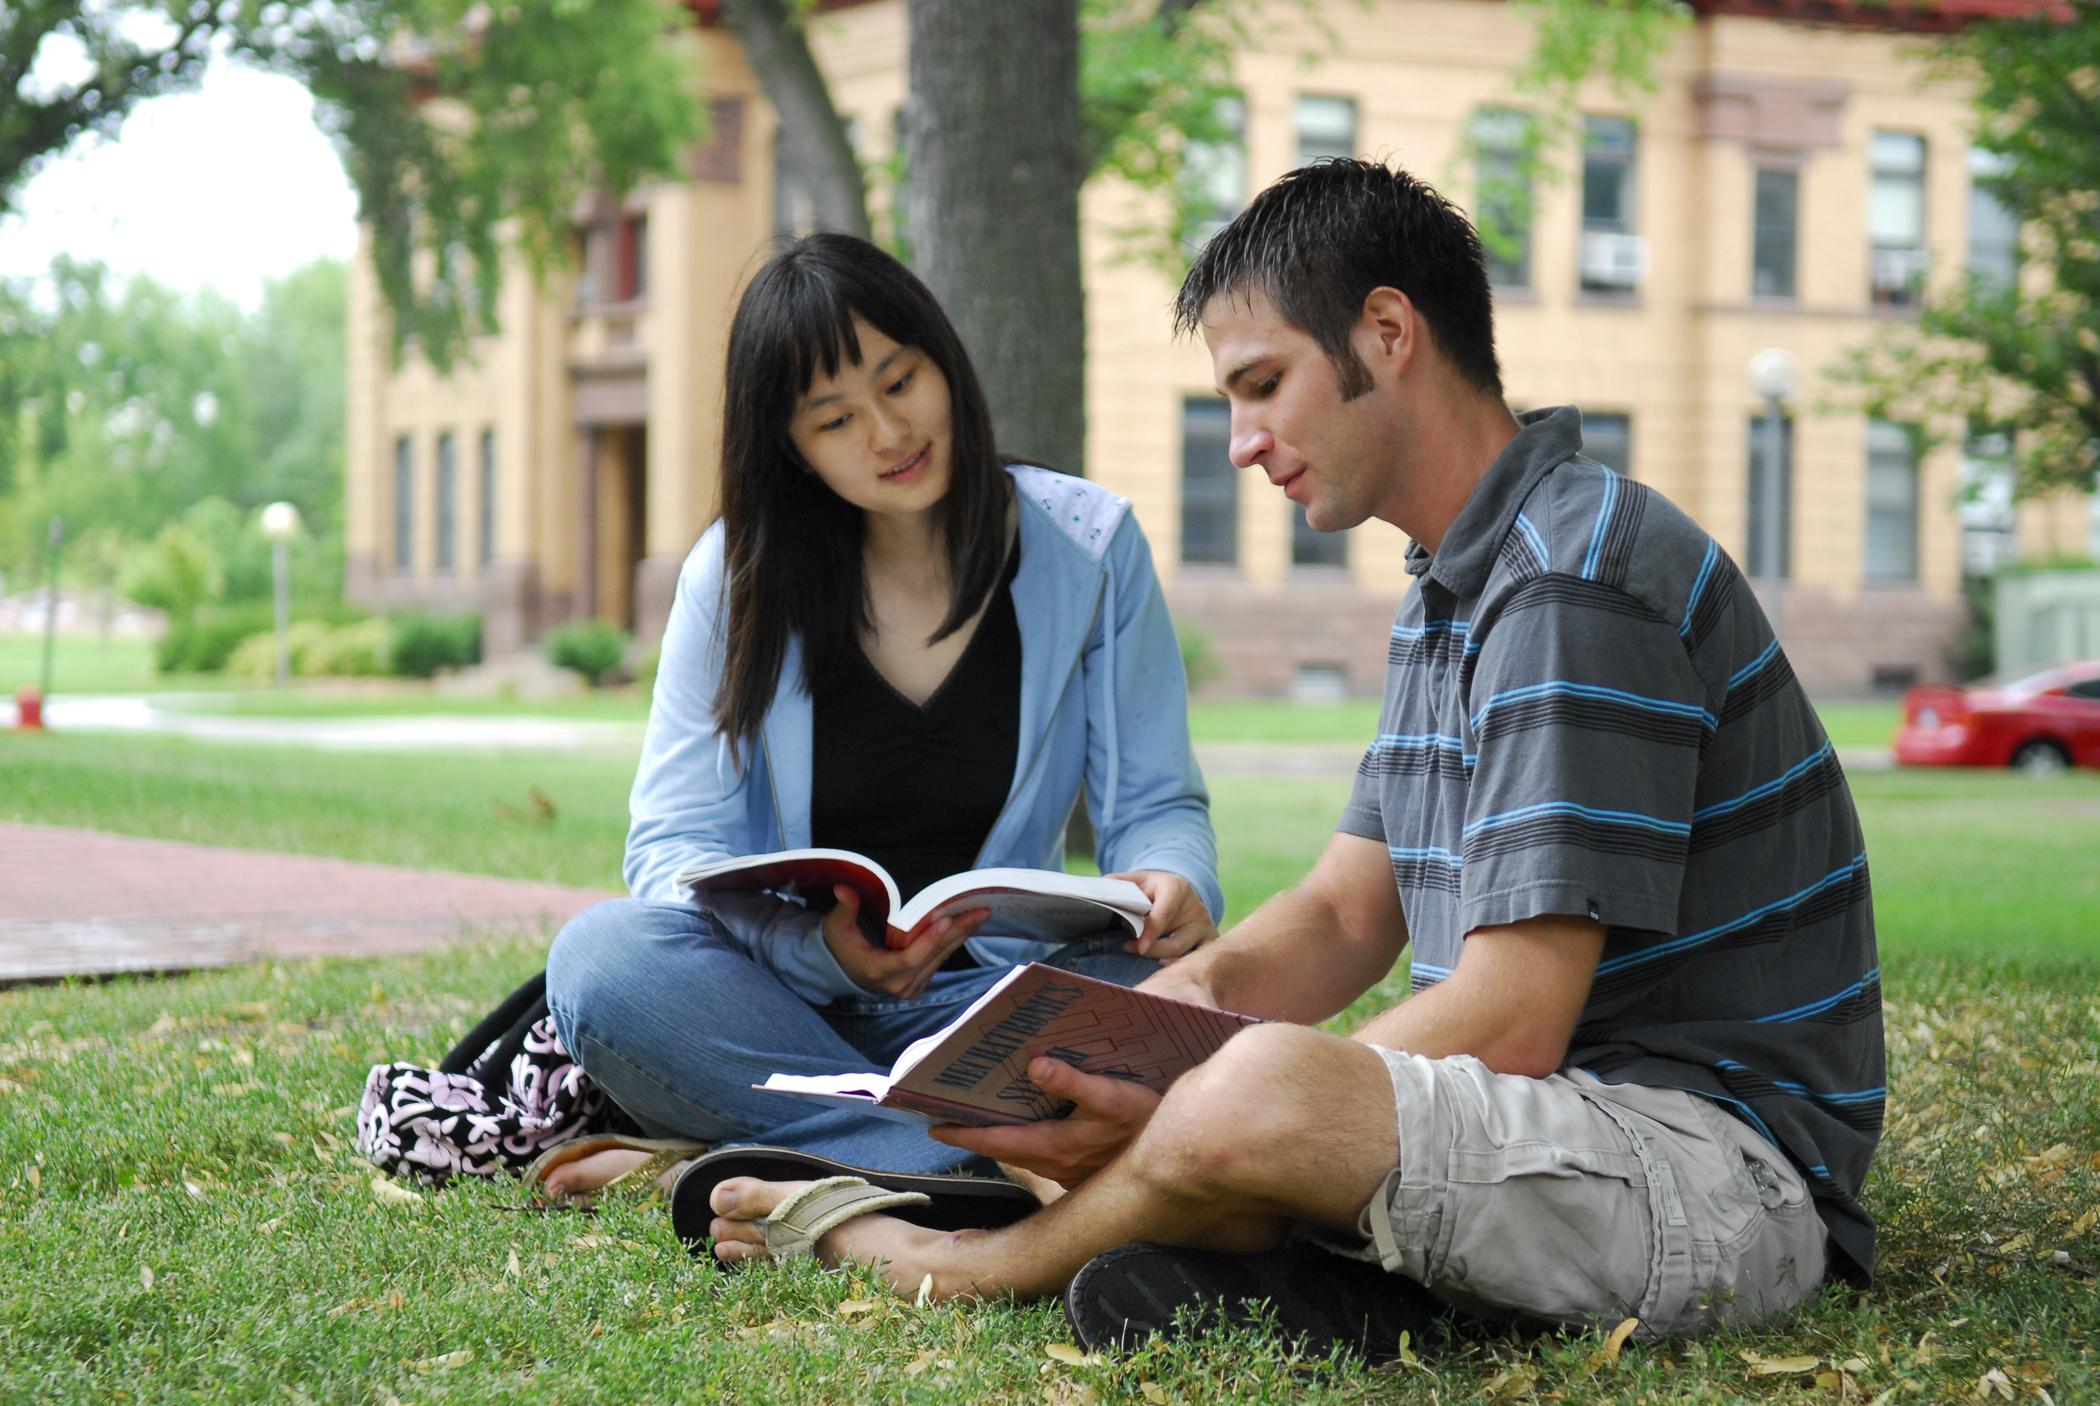 People | University Relations | NDSU